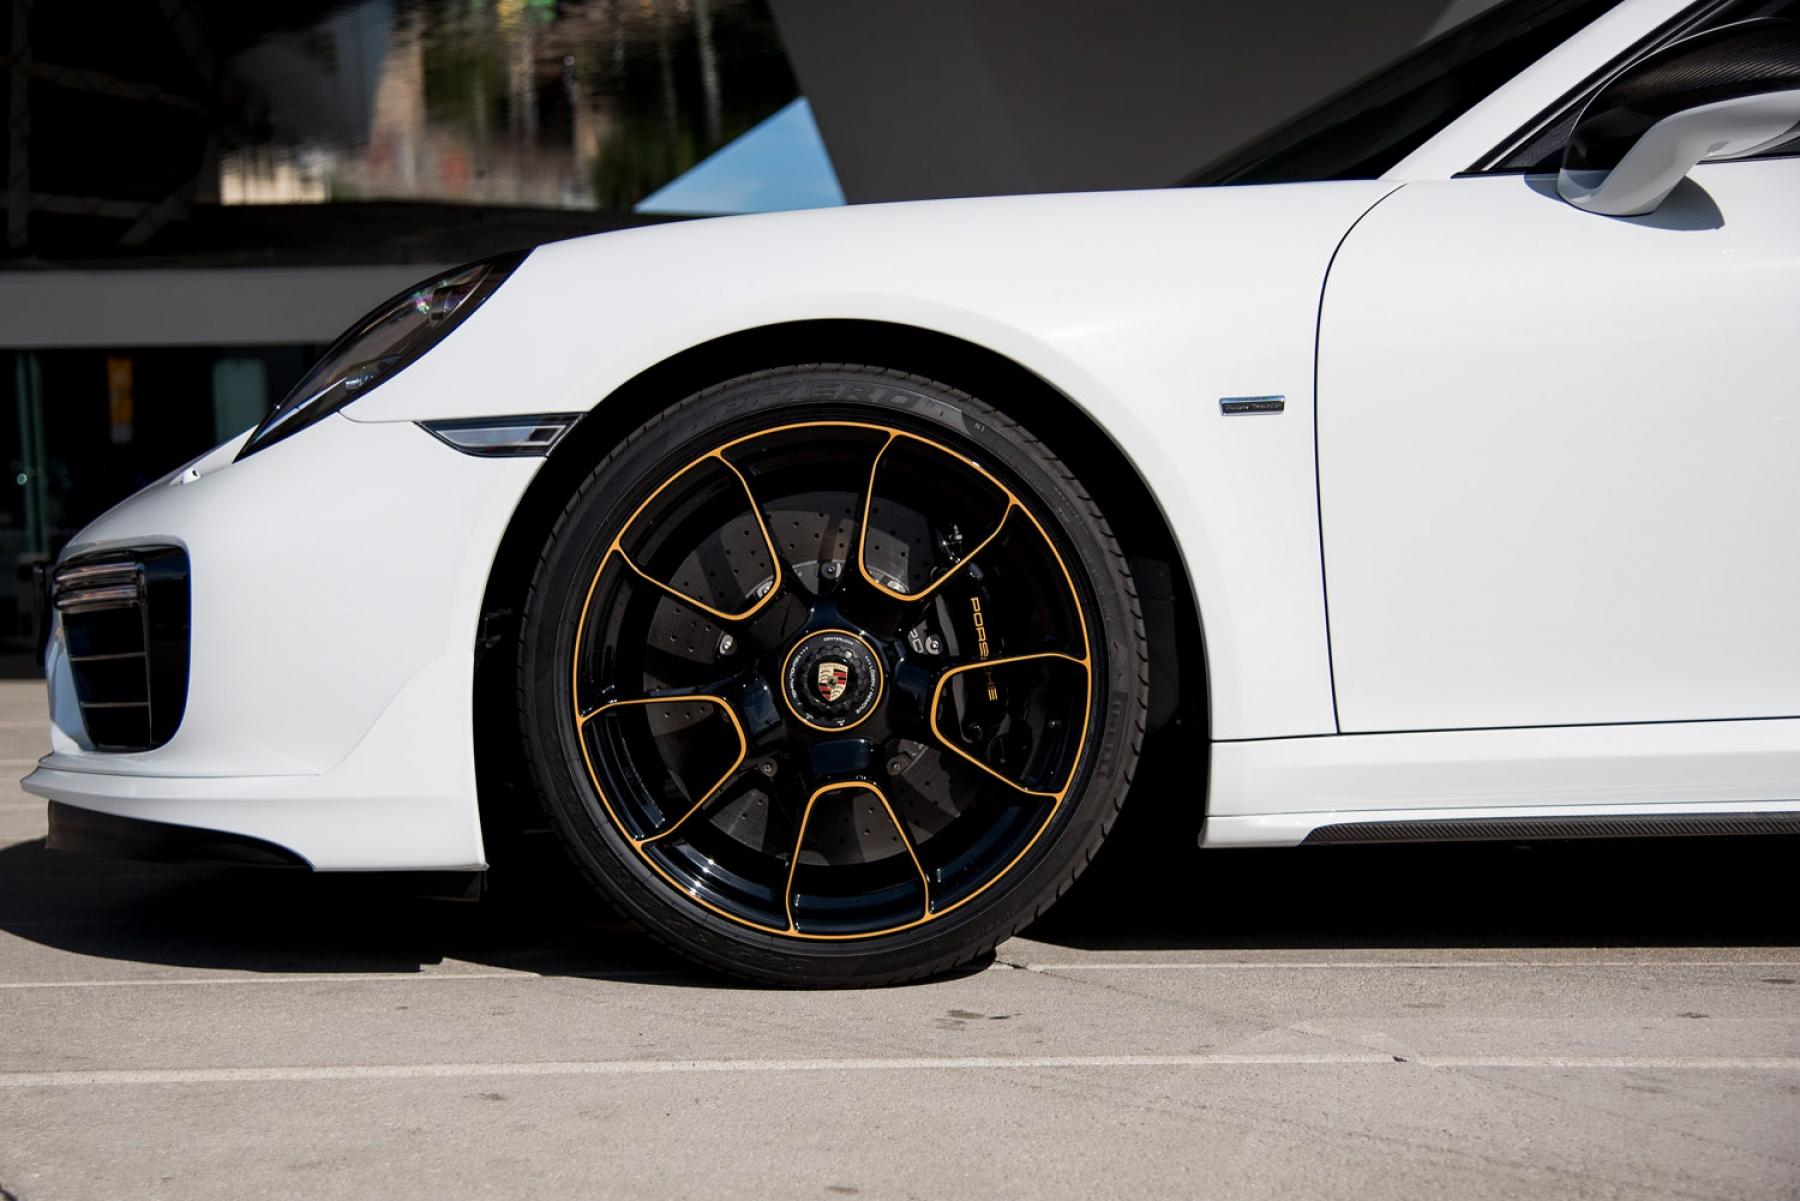 911 Turbo S Exclusive Series Carrara White Metallic